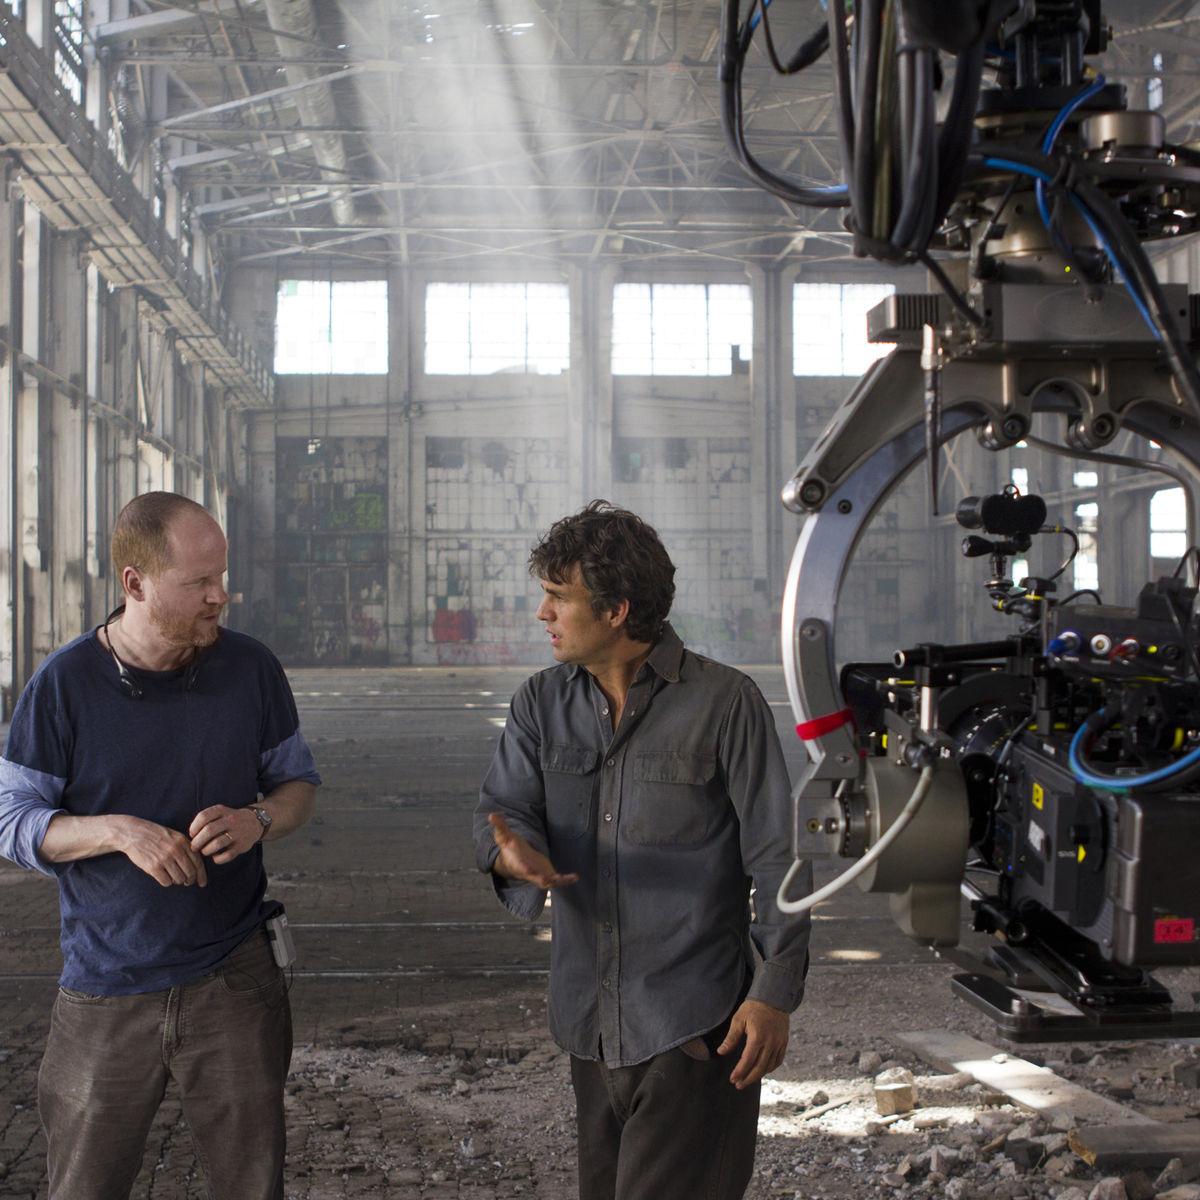 The-Avengers-Joss-Whedon-Directs-Mark-Ruffalo.jpg